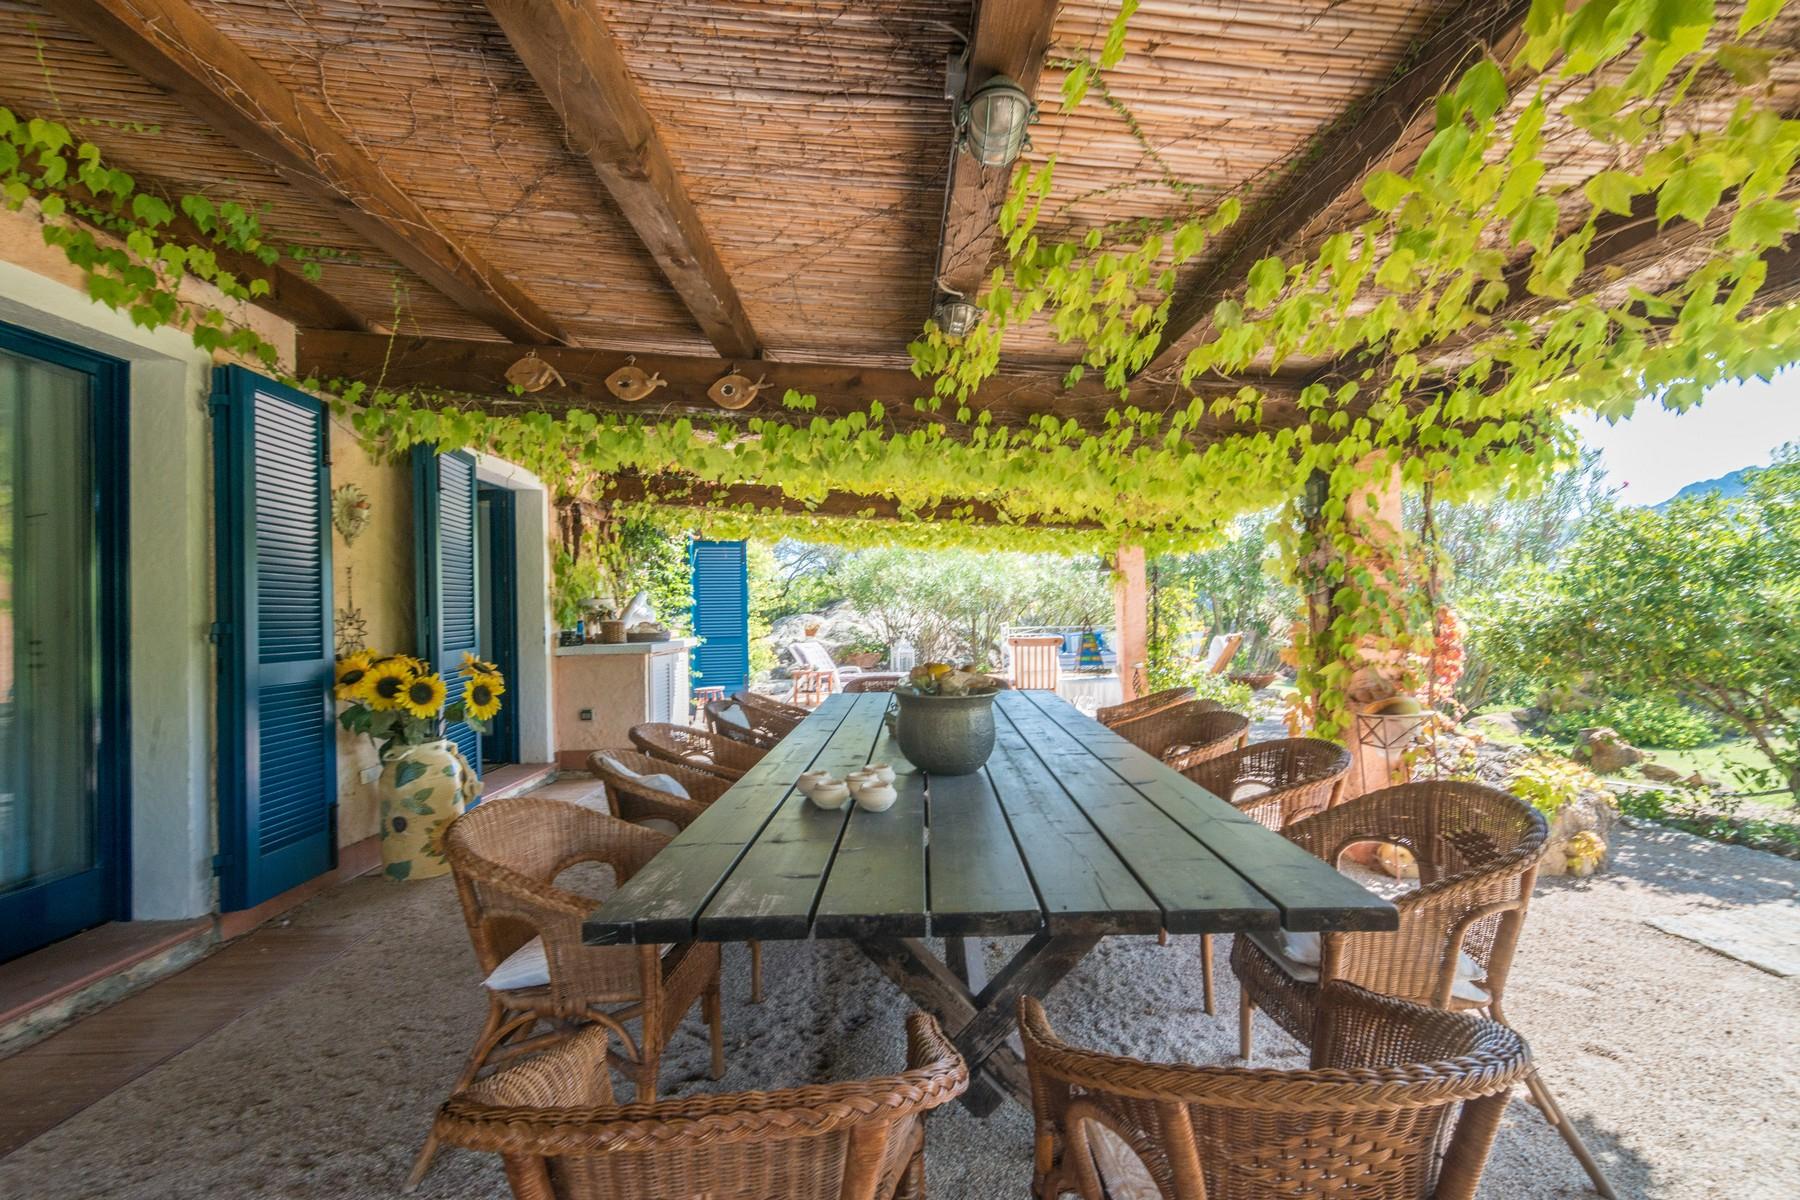 Casa indipendente in Vendita a Olbia: 5 locali, 230 mq - Foto 2